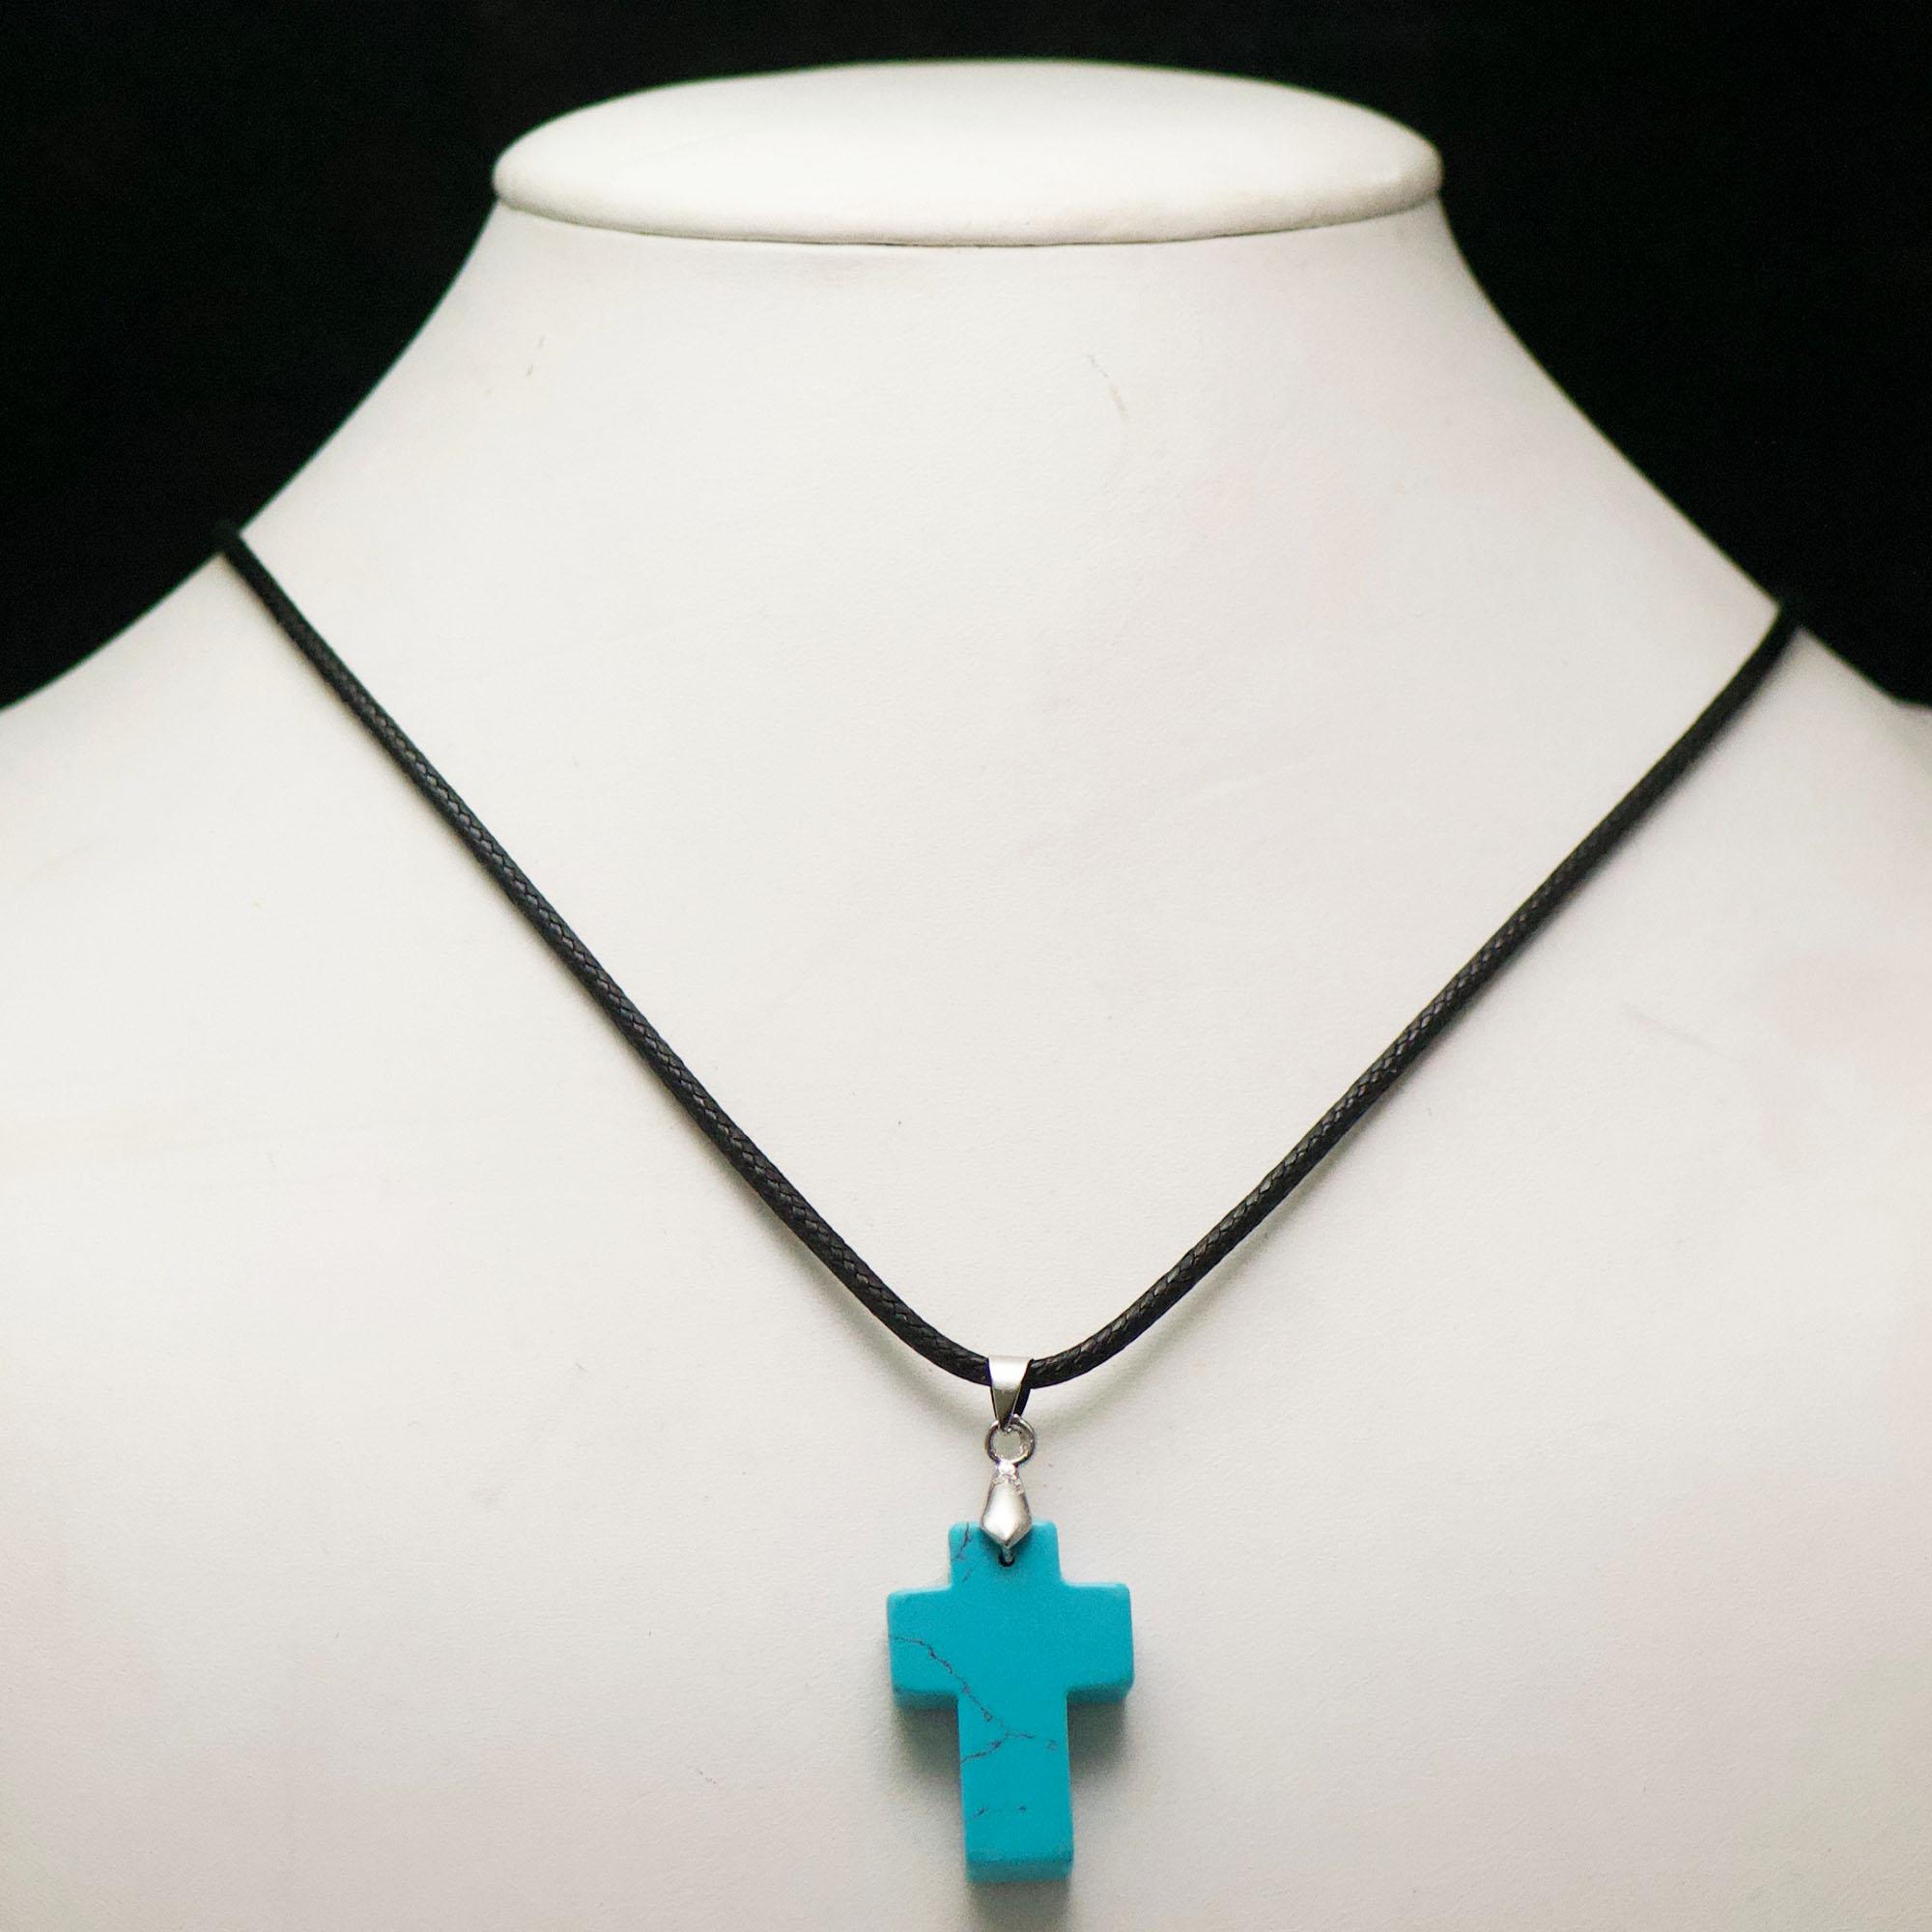 1 pendentif pierre naturelle croix 30x20x7 mm, turquoise